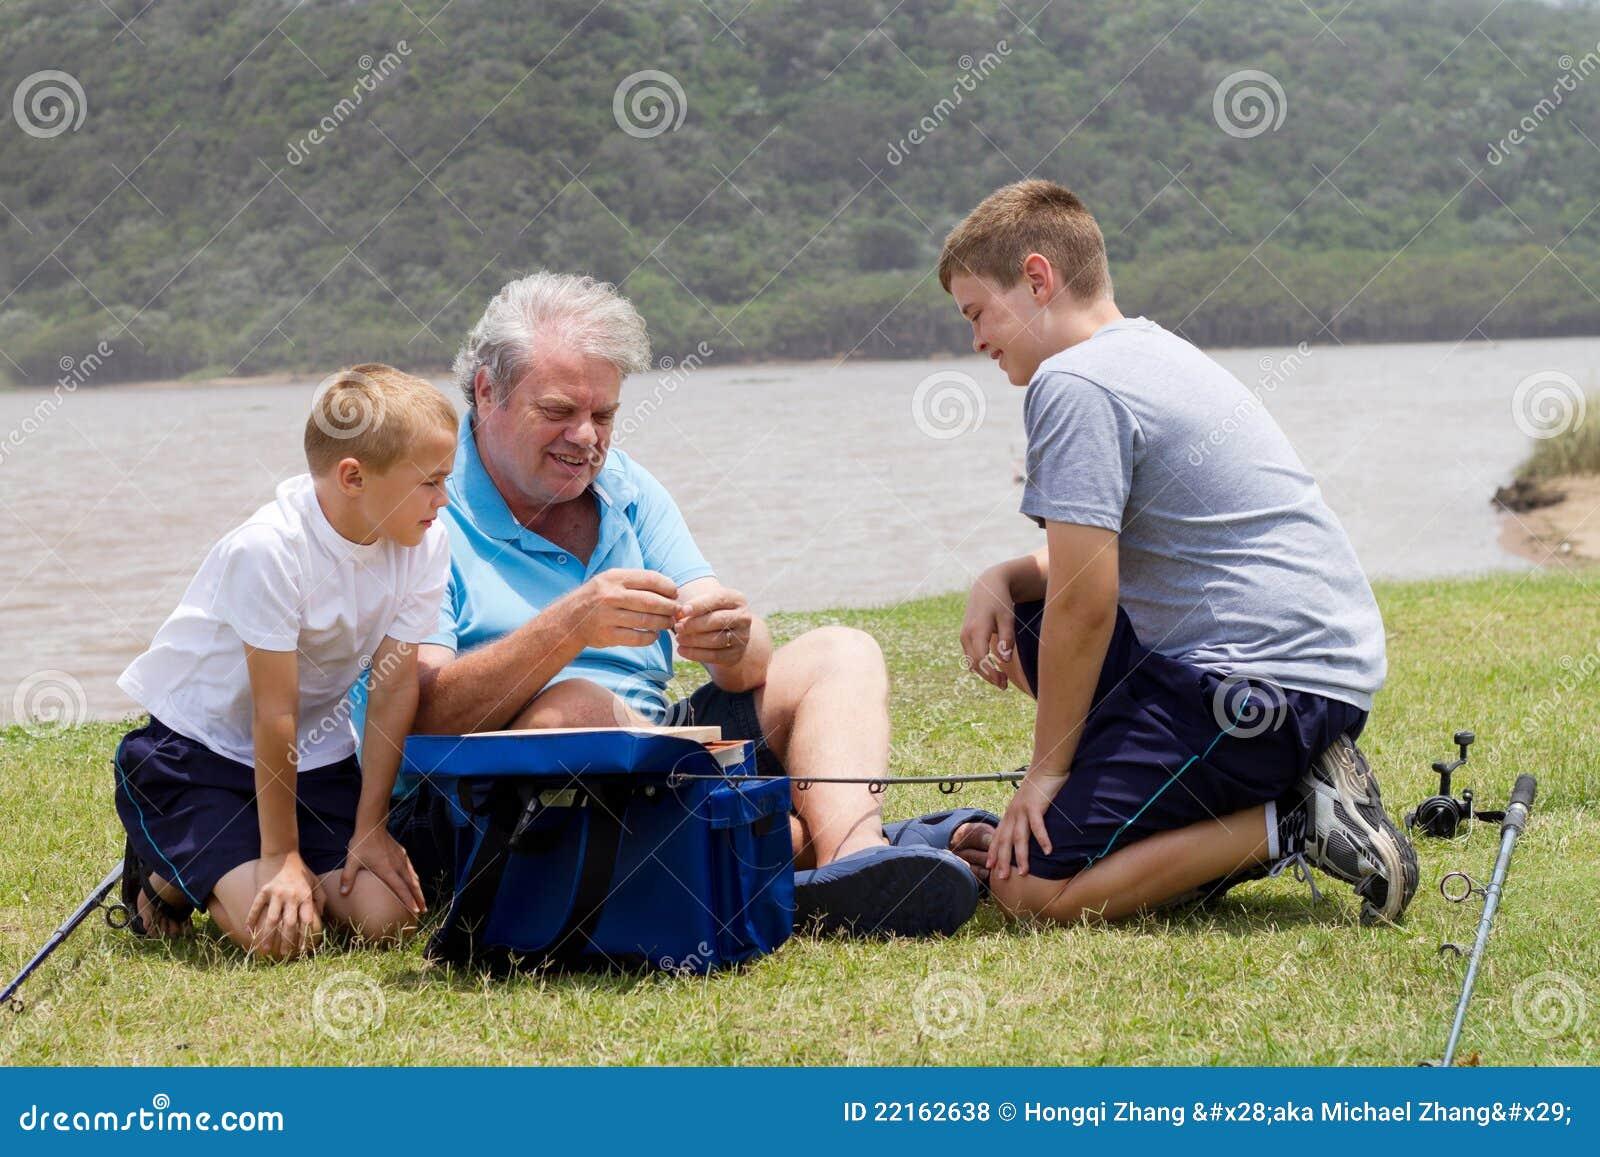 Teaching fishing